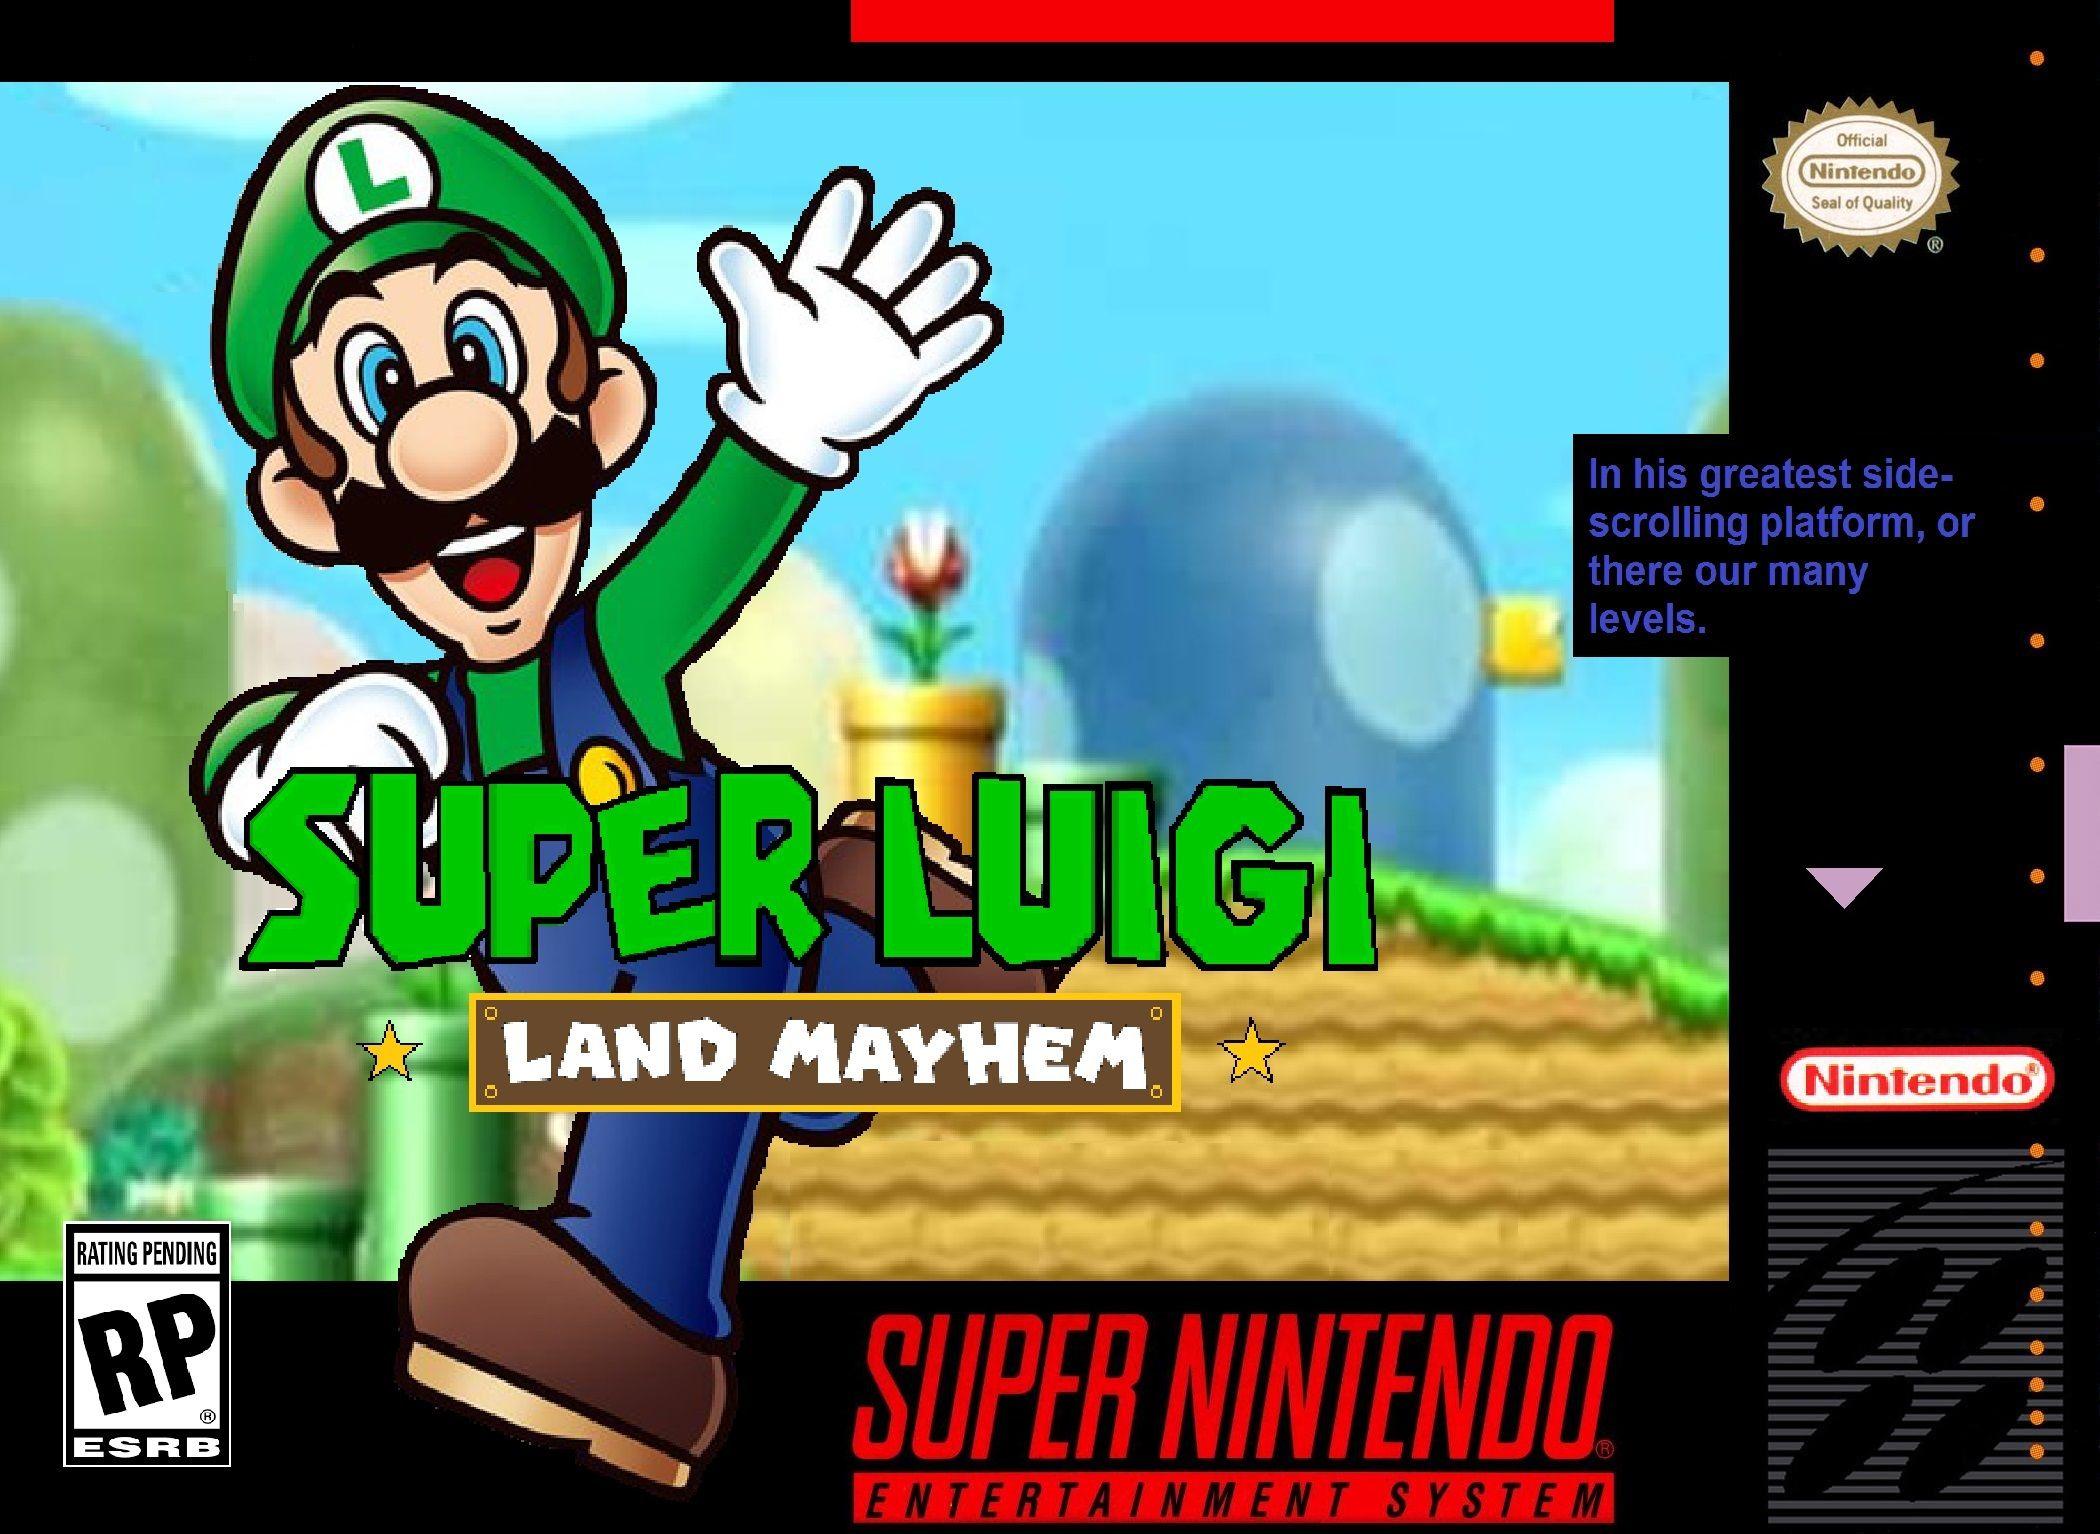 Super Luigi Land Mayhem Snes Boxart Jogos Classicos Jogos Retro